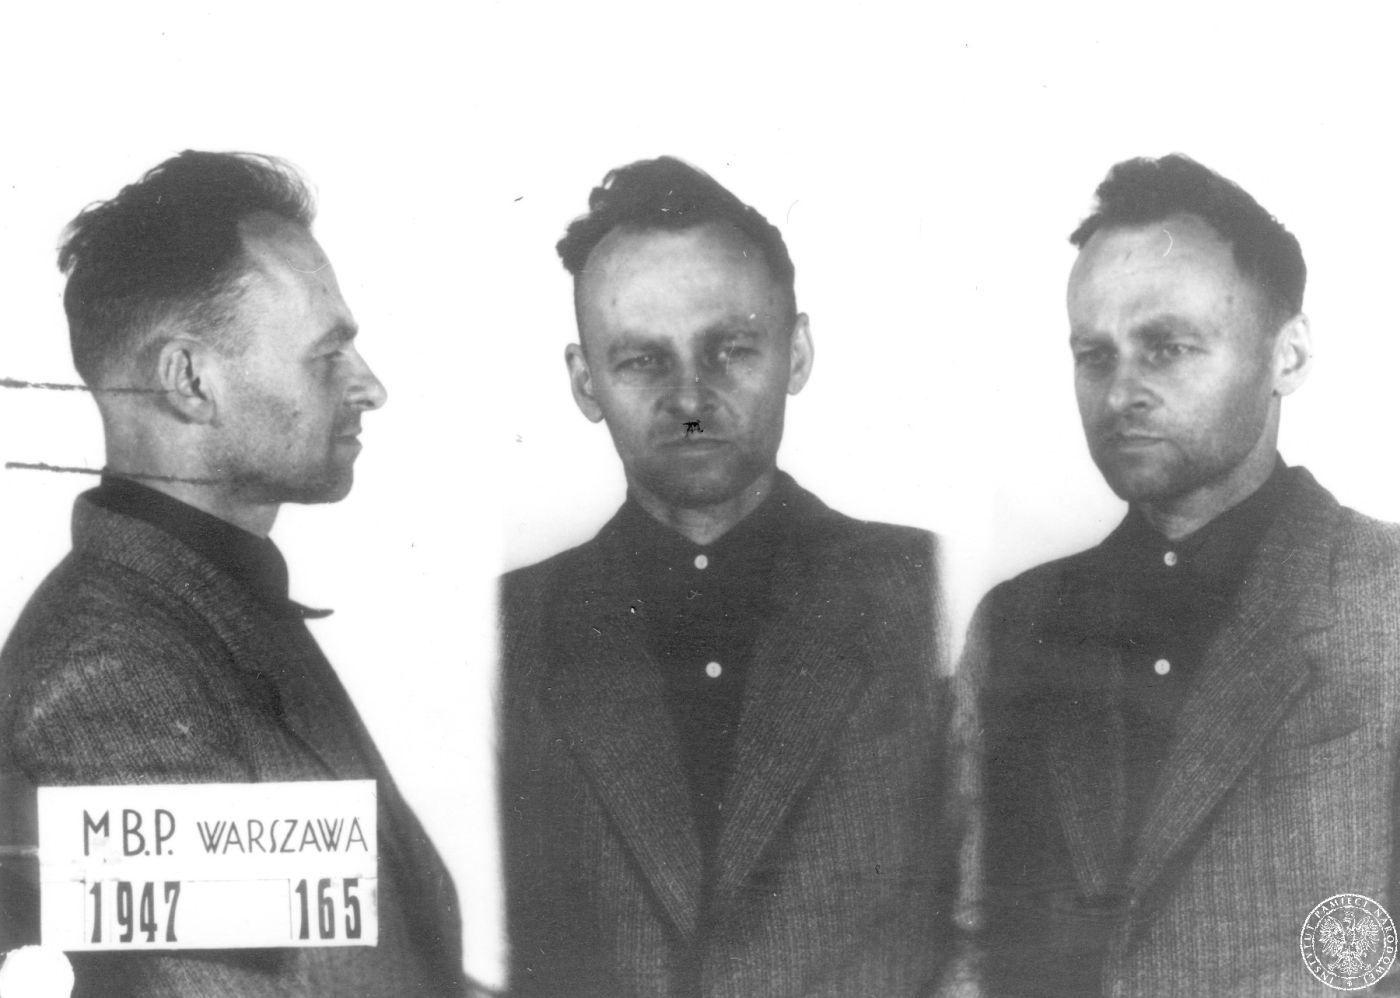 https://upload.wikimedia.org/wikipedia/commons/0/05/Pilecki_photo_1947.jpg